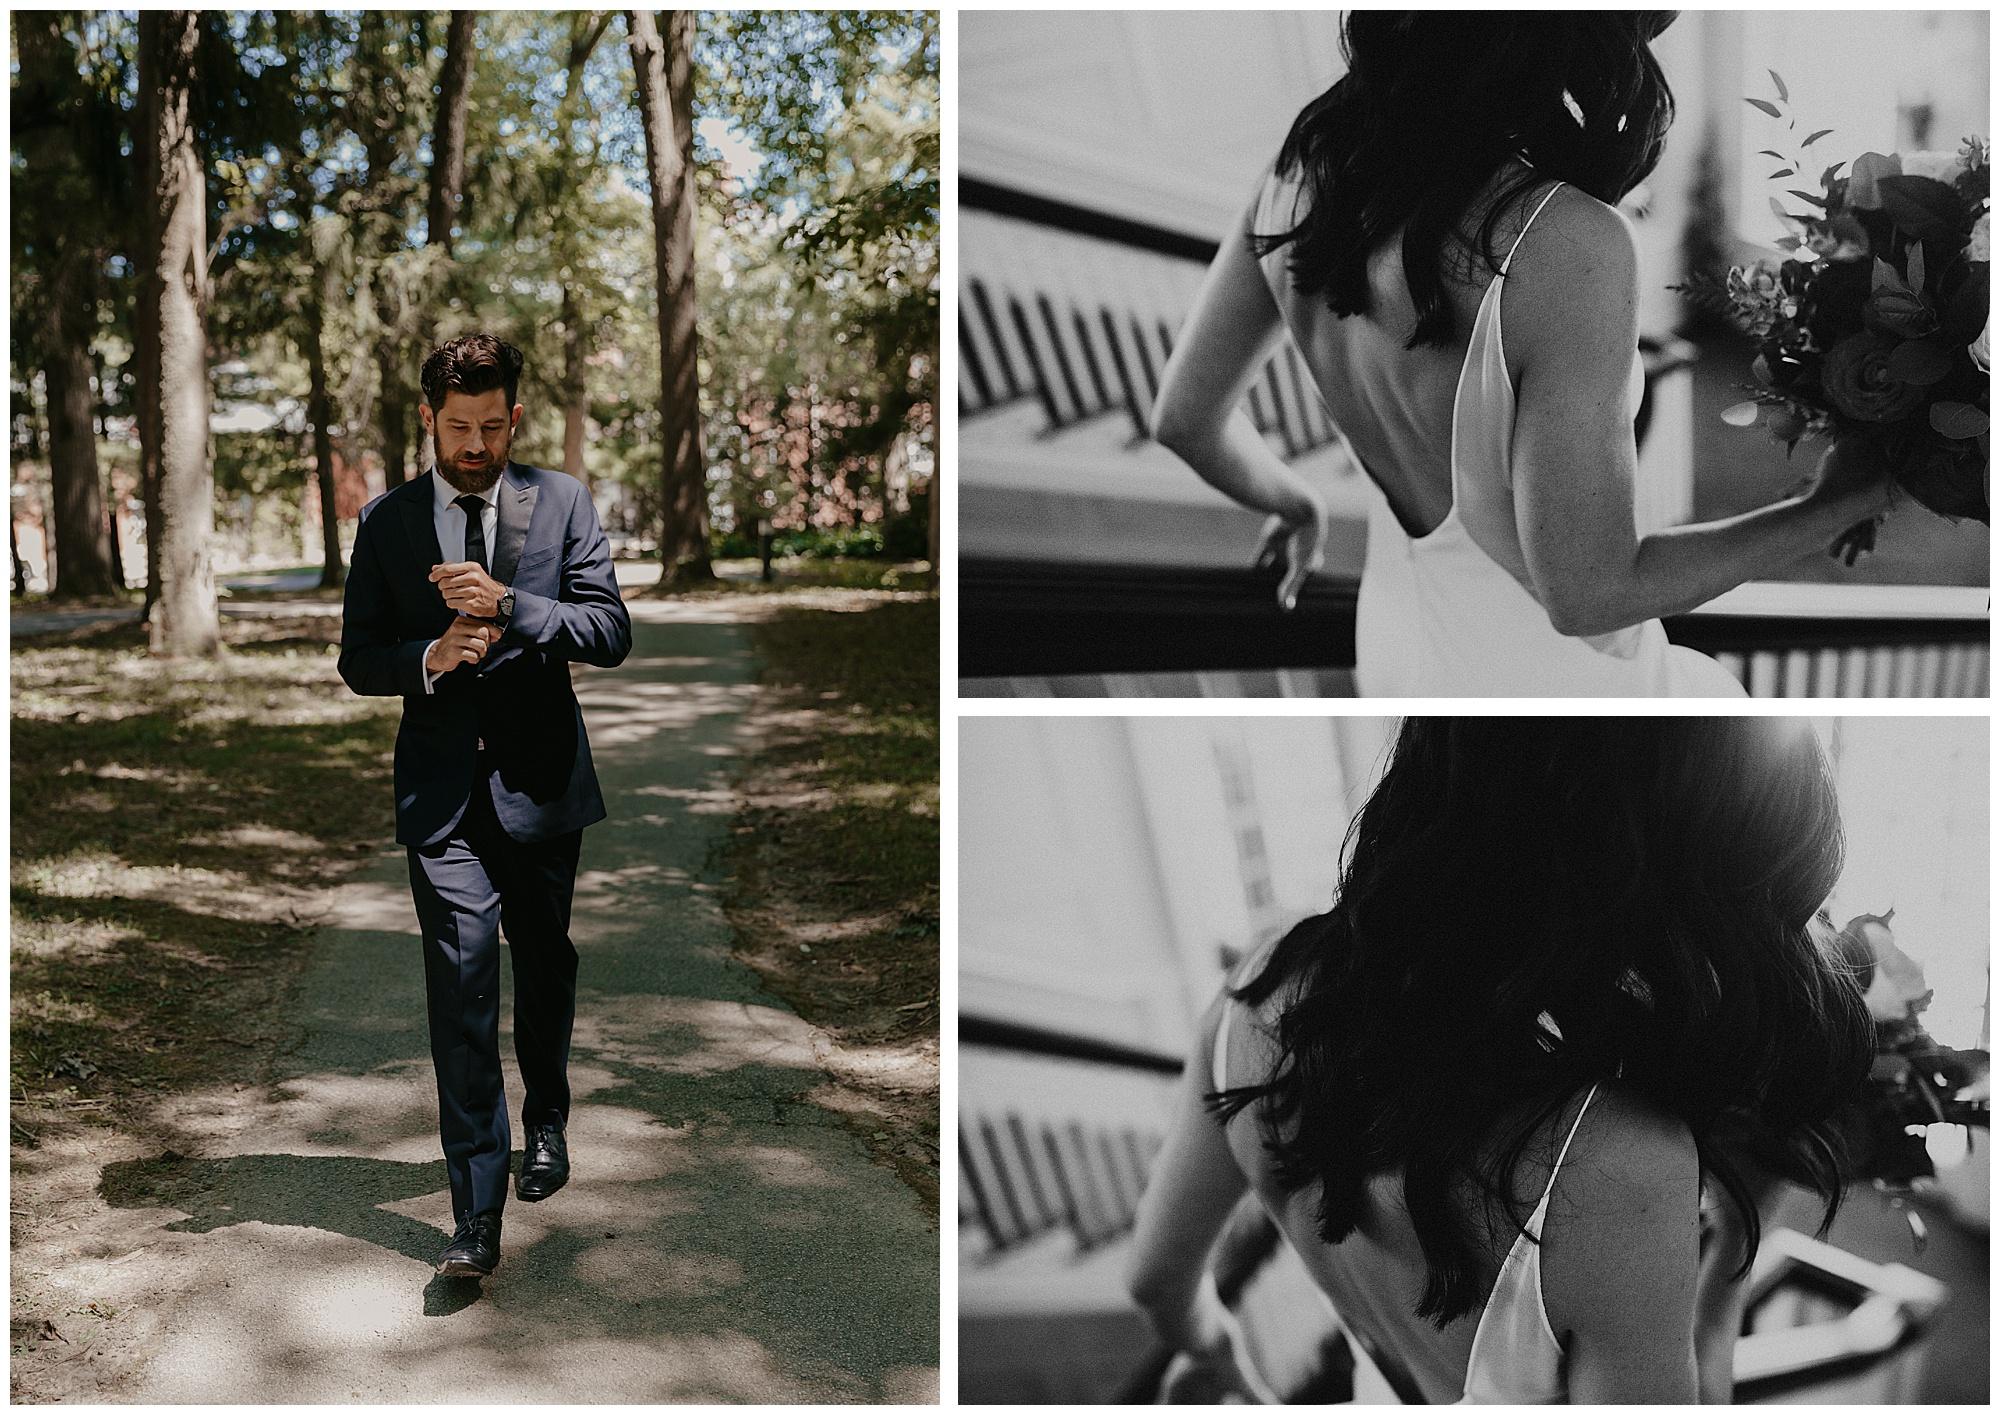 allerton_park_wedding_champaign_il_chicago_wright_photographs_ne_0007.jpg